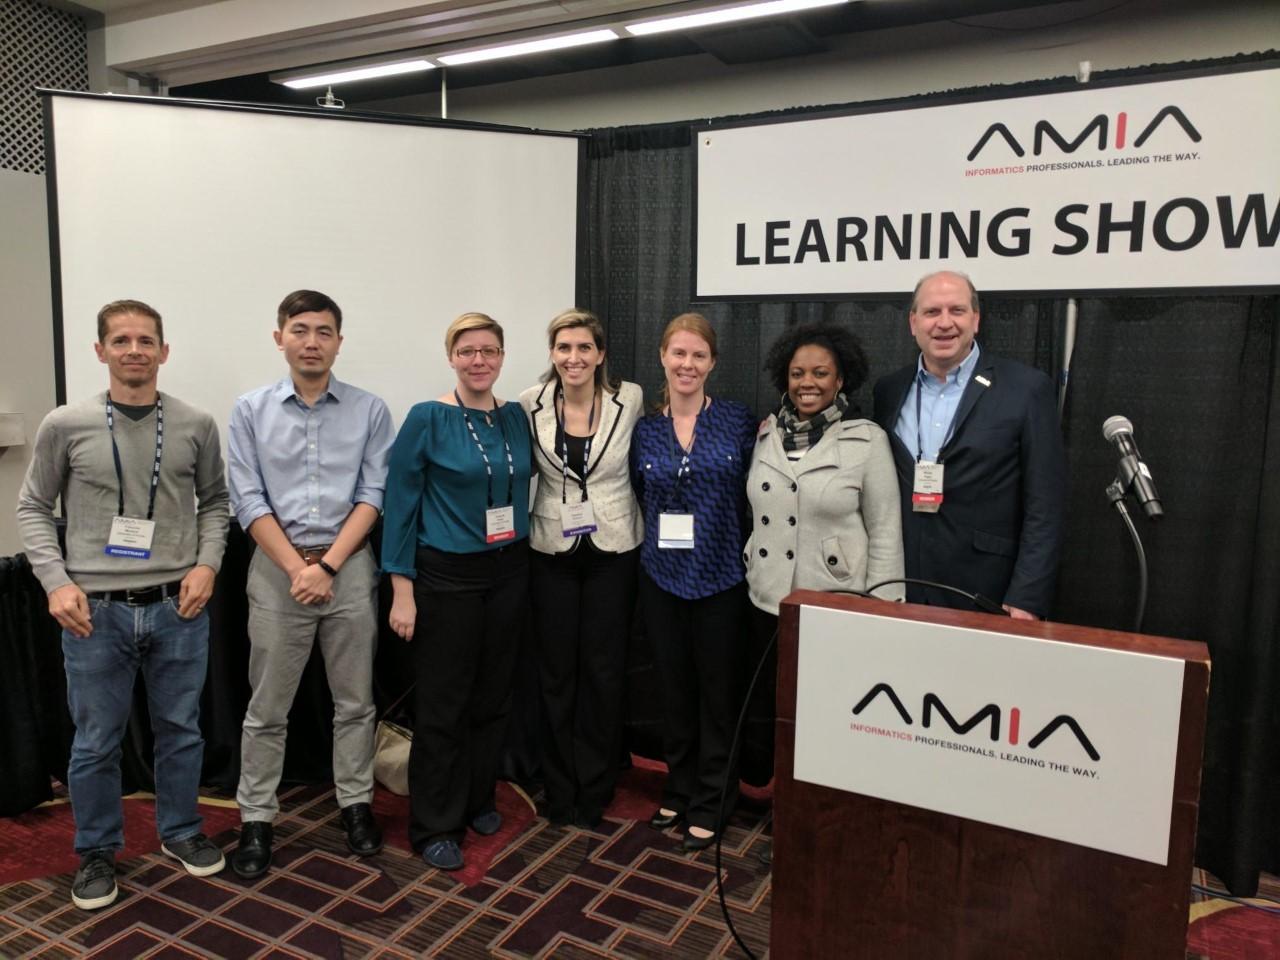 From left to right: François Modave, Ph.D., Yi Guo, Ph.D., Amanda Hicks, Ph.D., Sandra Salloum, Katie Blackburn, TaJuana Chisholm